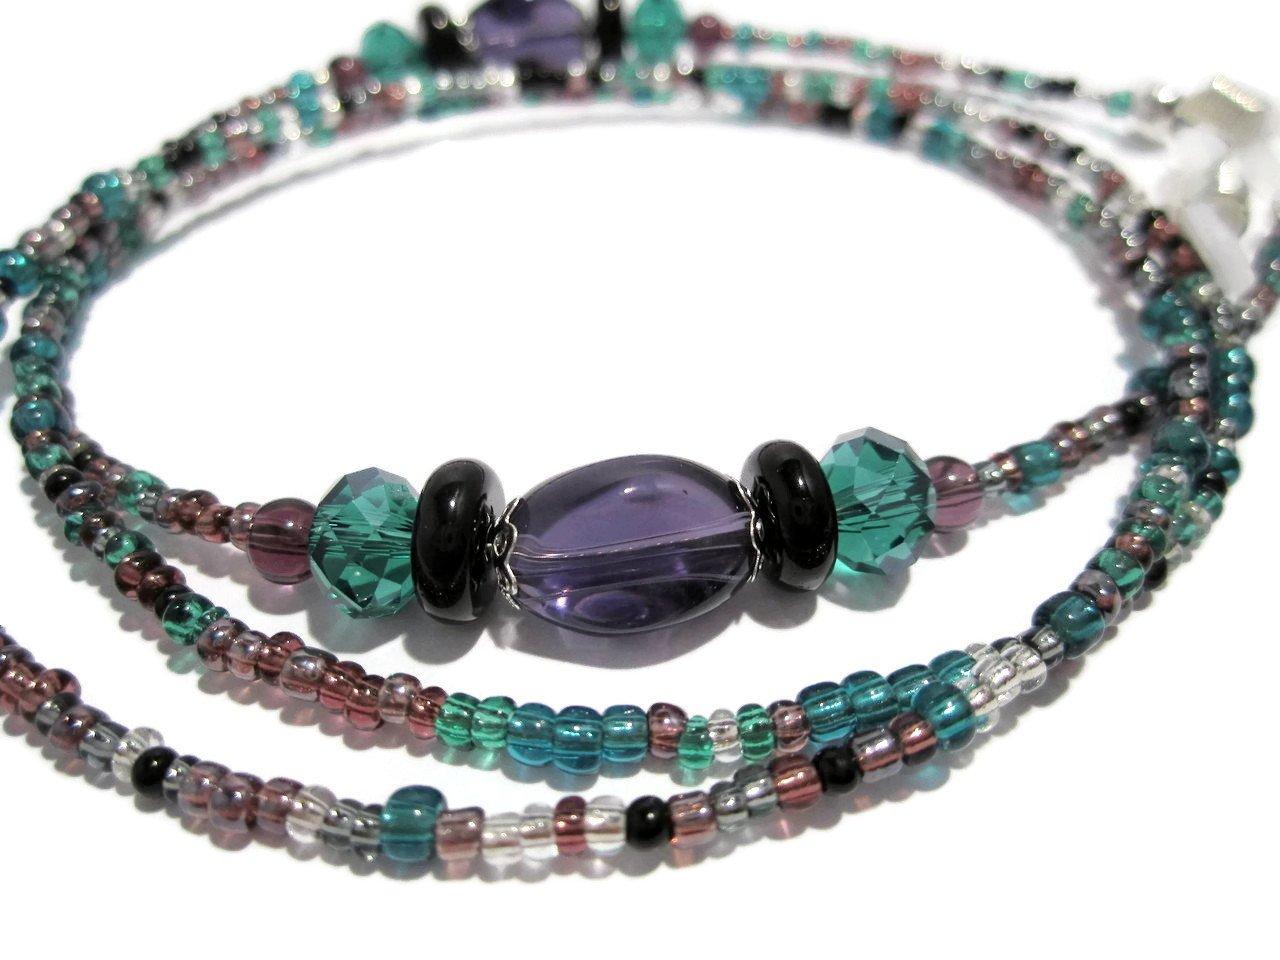 Purple and Teal Mix Beaded Eyeglass Holder - Glasses Chain - Eyeglass Lanyard